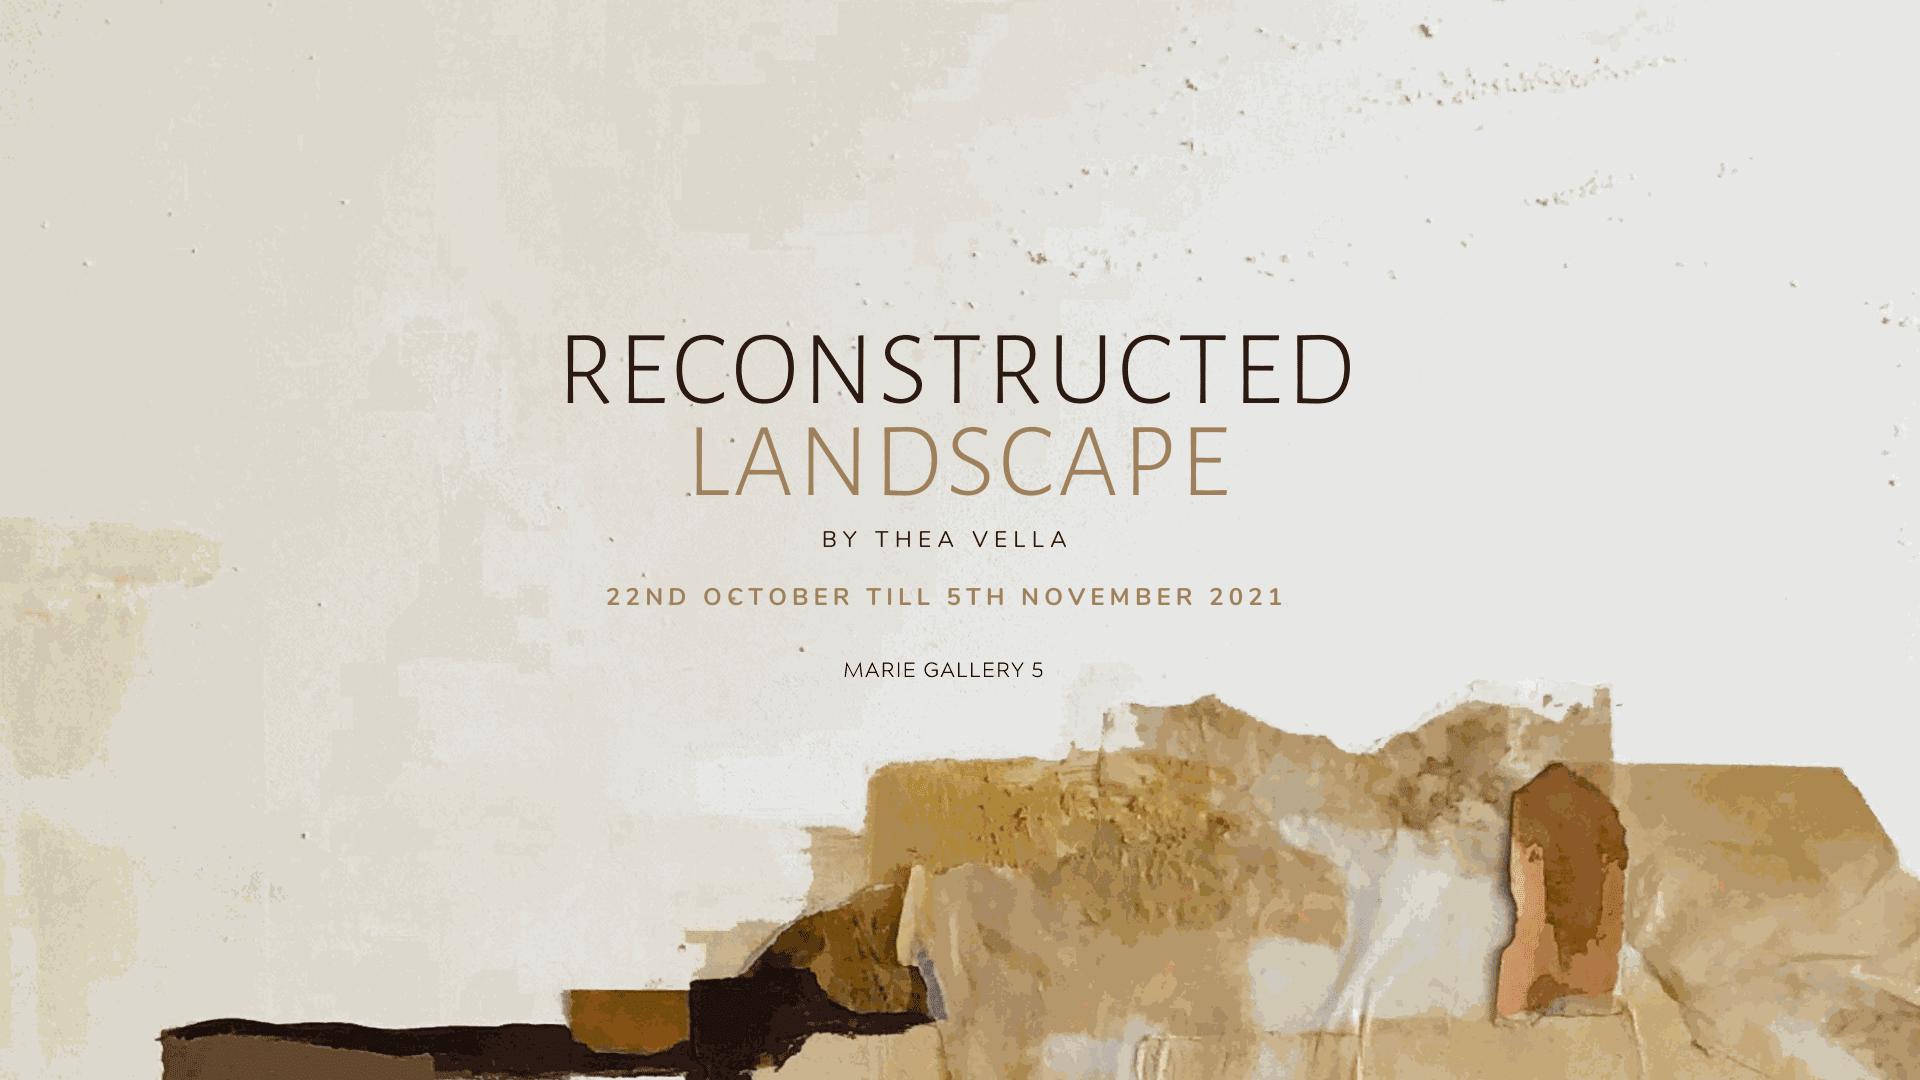 Reconstructed Landscape